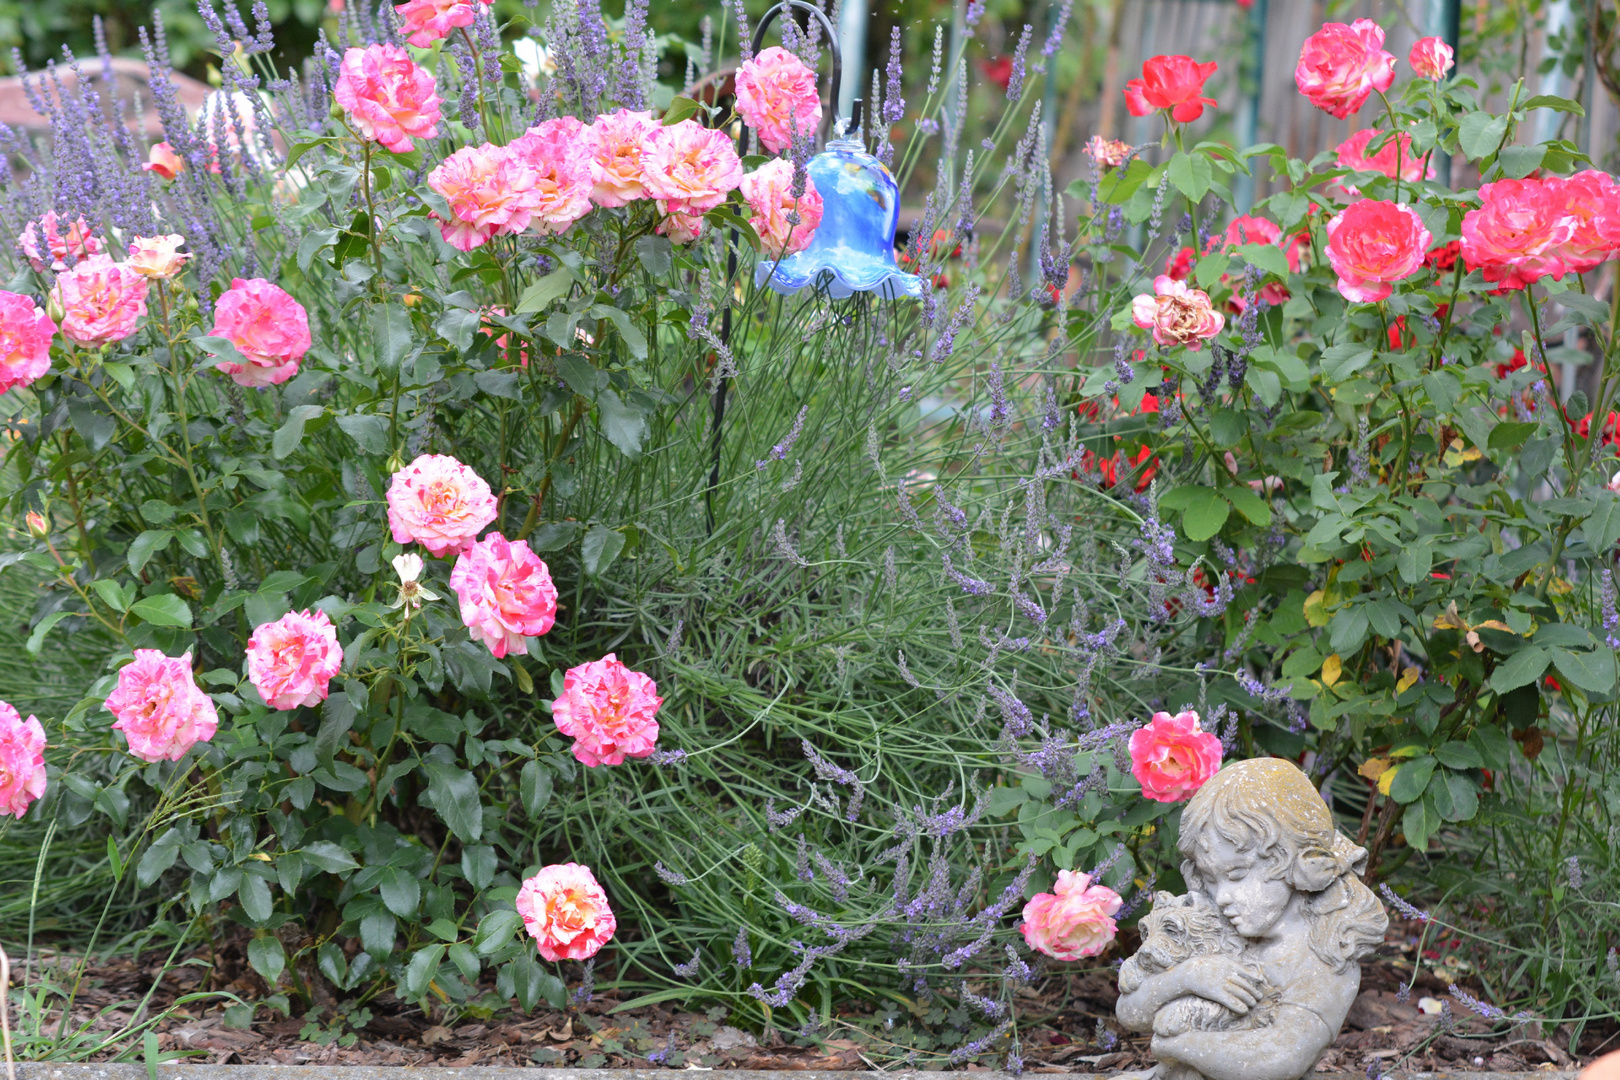 Beliebt Bevorzugt Lavendel in den Rosen Foto & Bild | pflanzen, pilze & flechten &RA_05